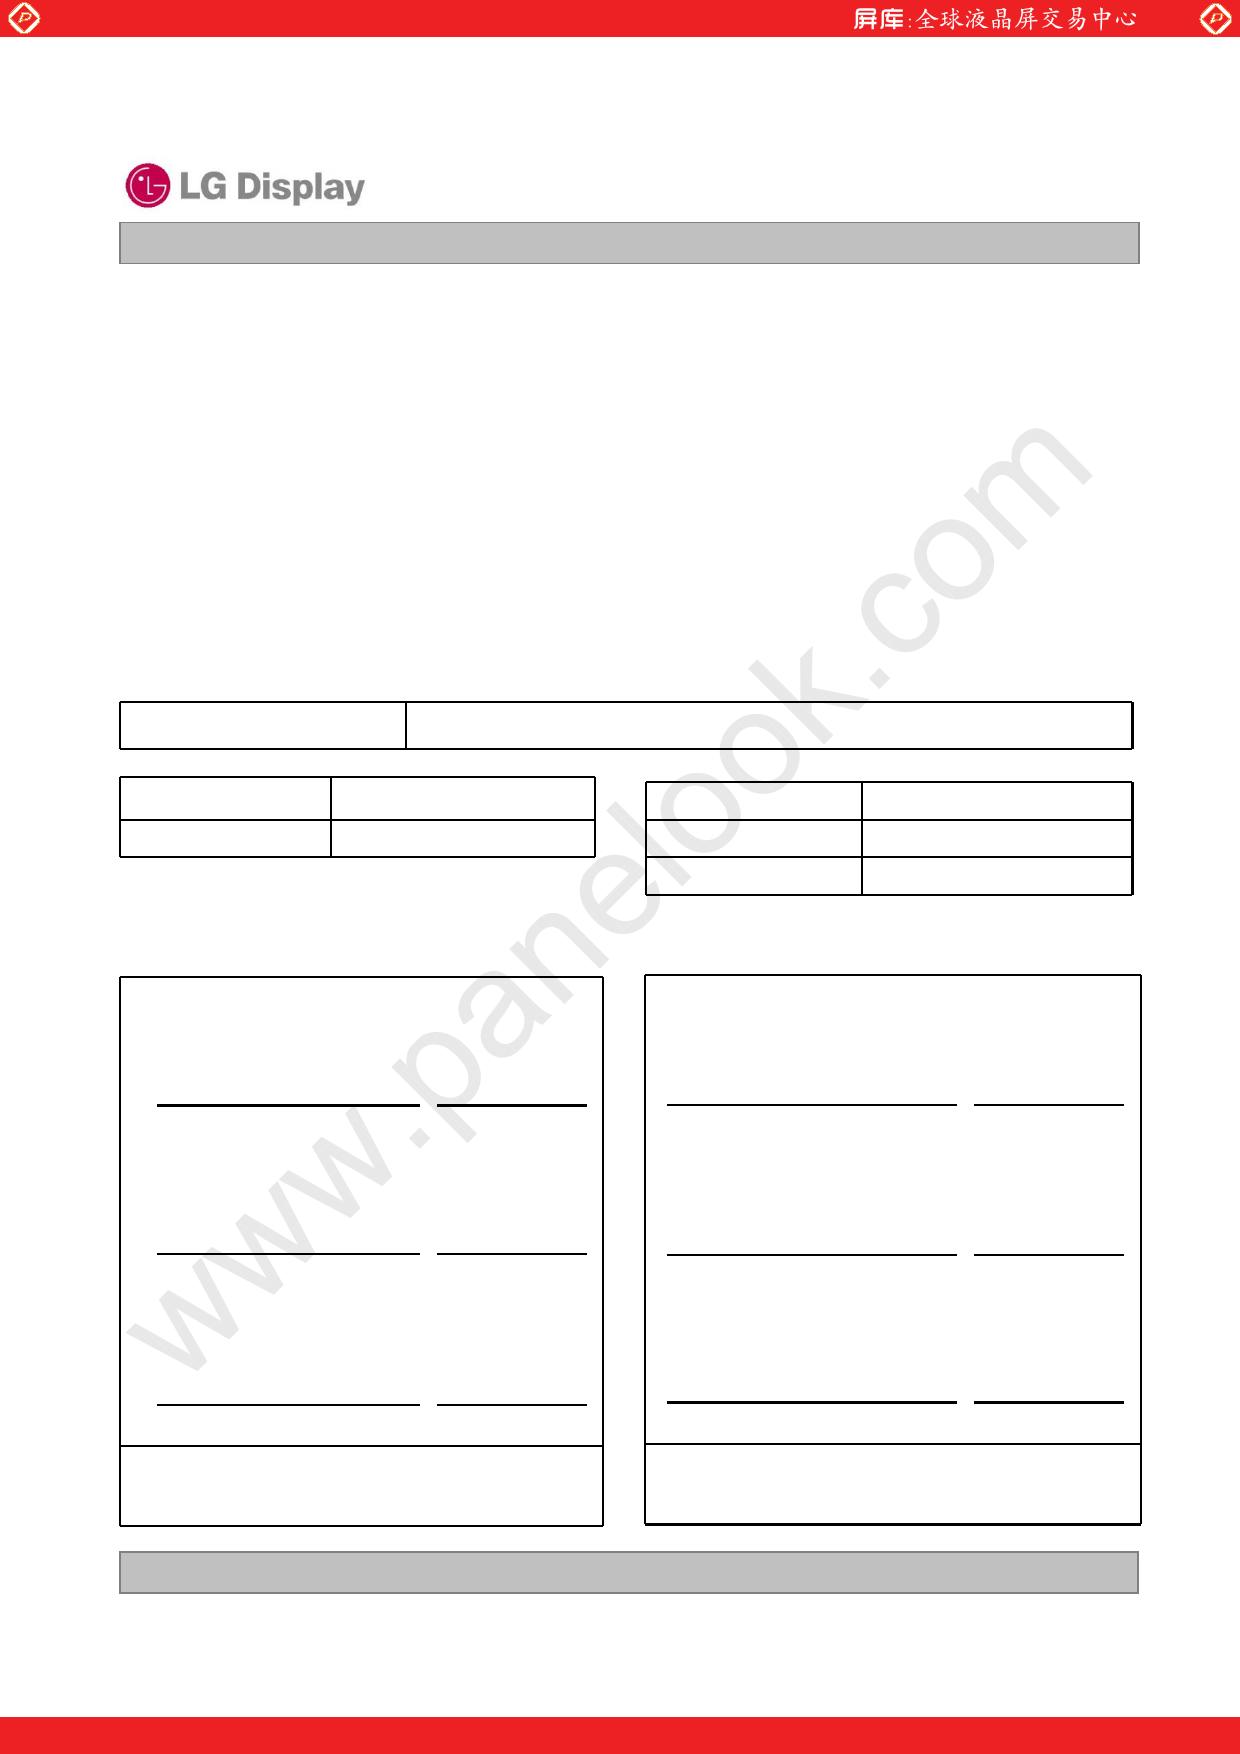 LC320WUG-SCA1 datasheet